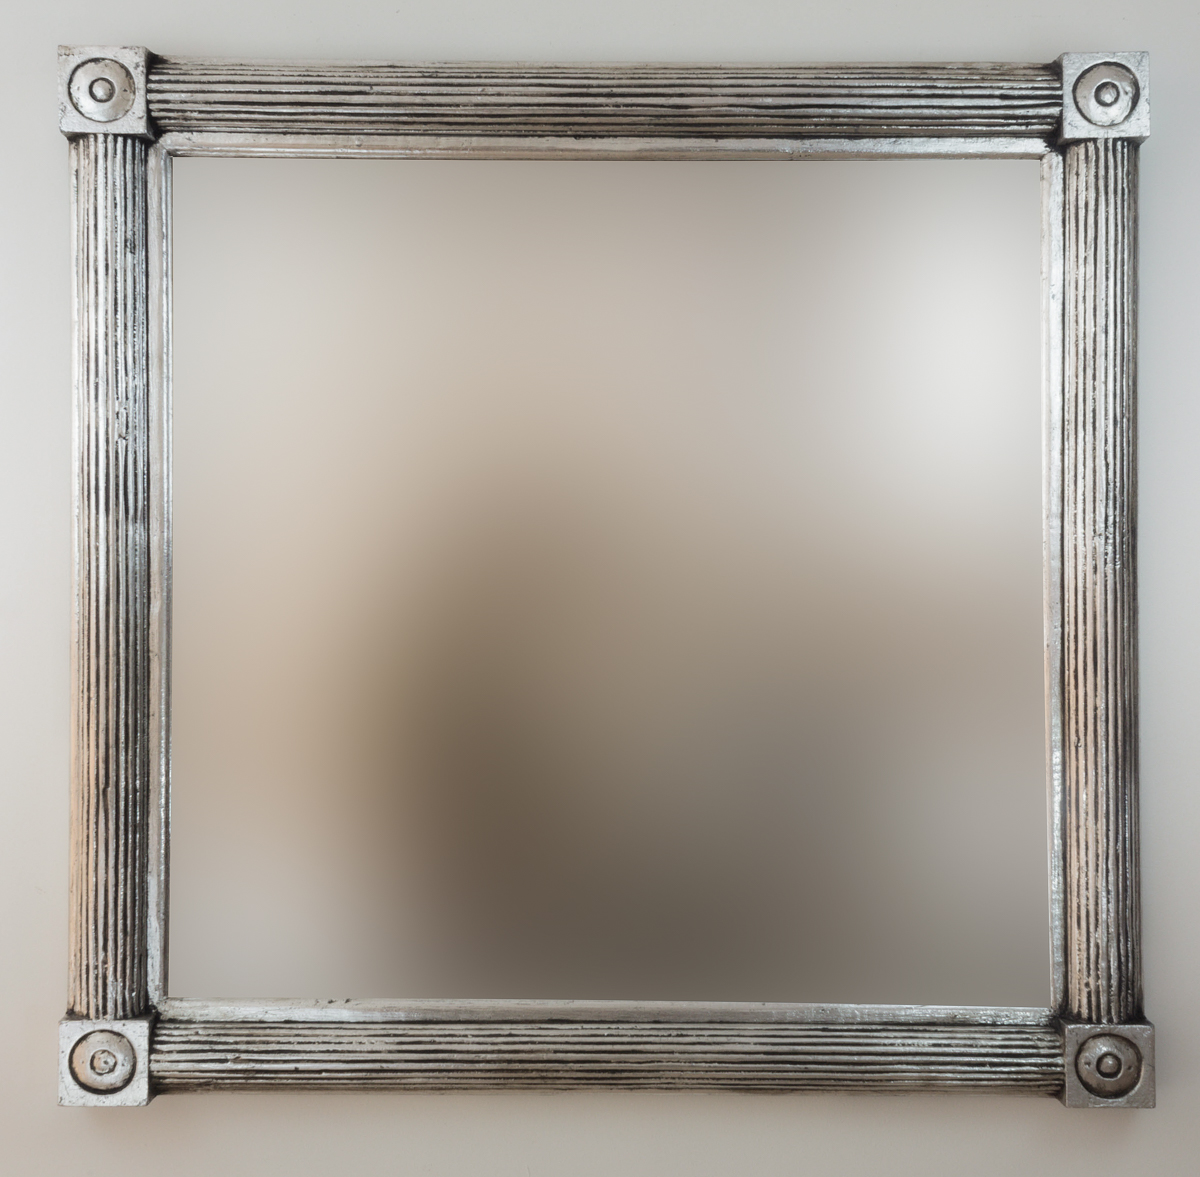 Espejo decorativo de pared en madera bulig sisir plata for Espejo madera envejecida